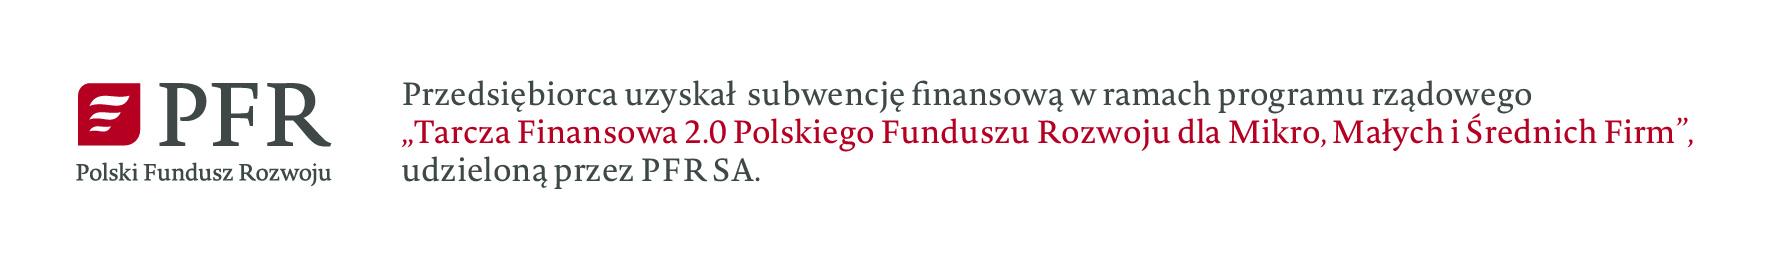 PFR subwencja